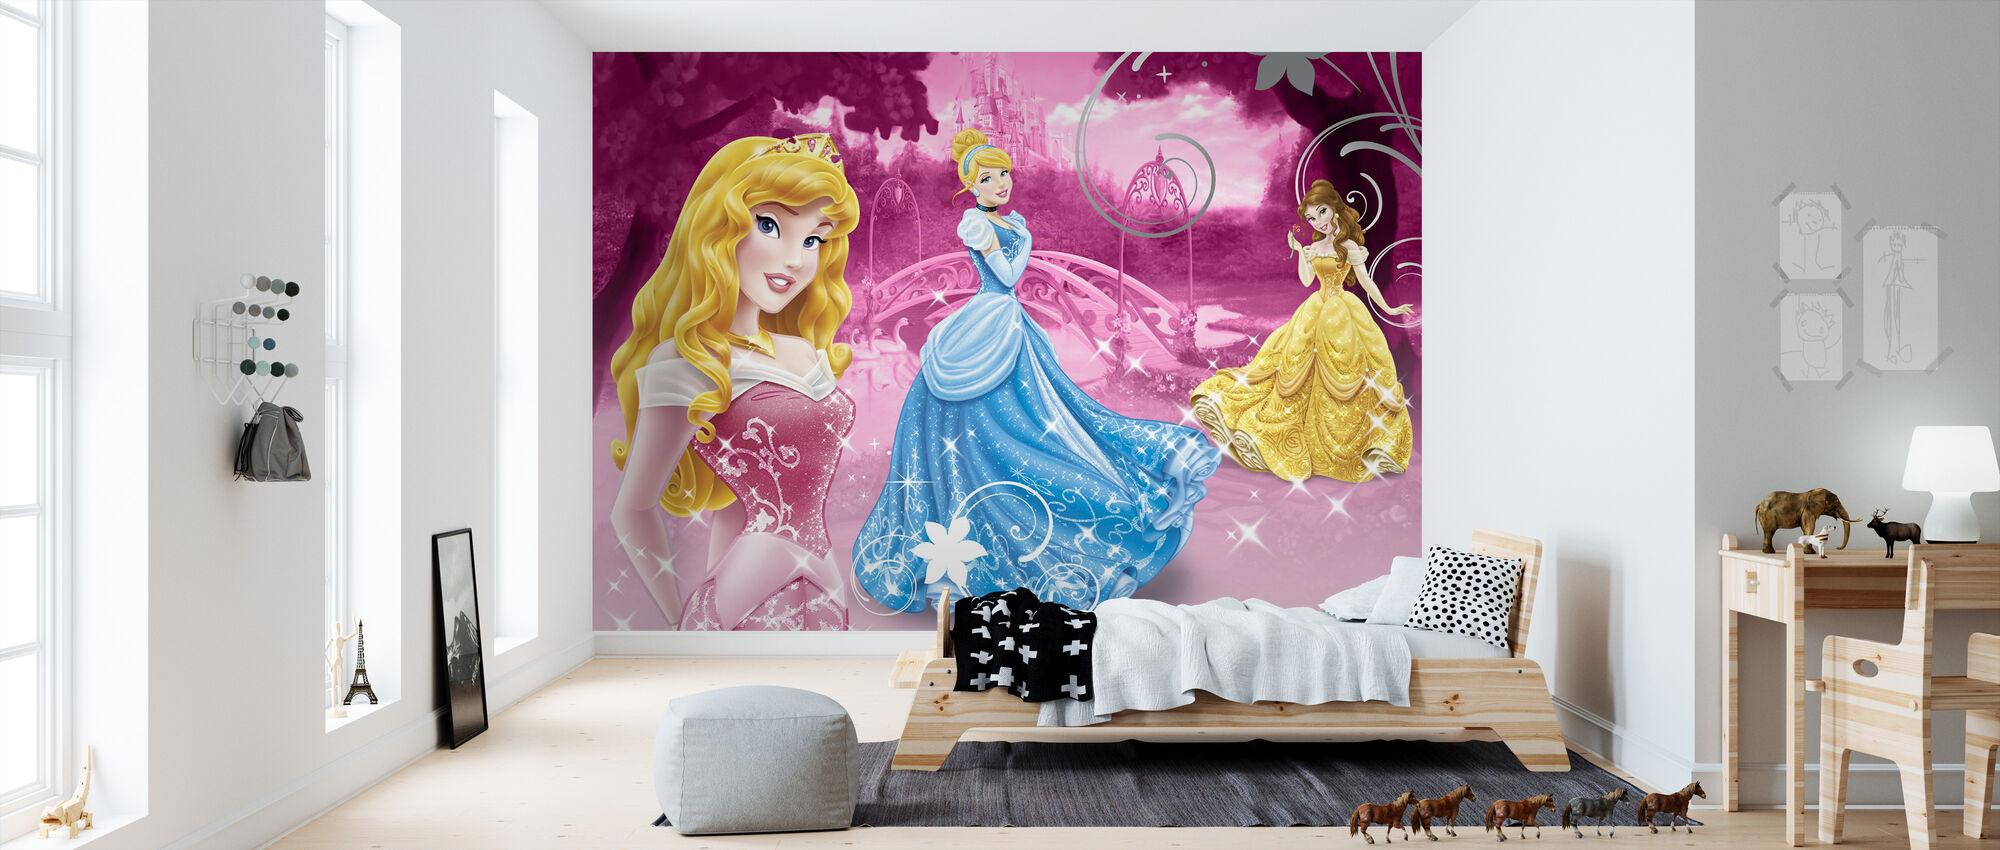 Disney Princess rosa - Tapet - Barnerom